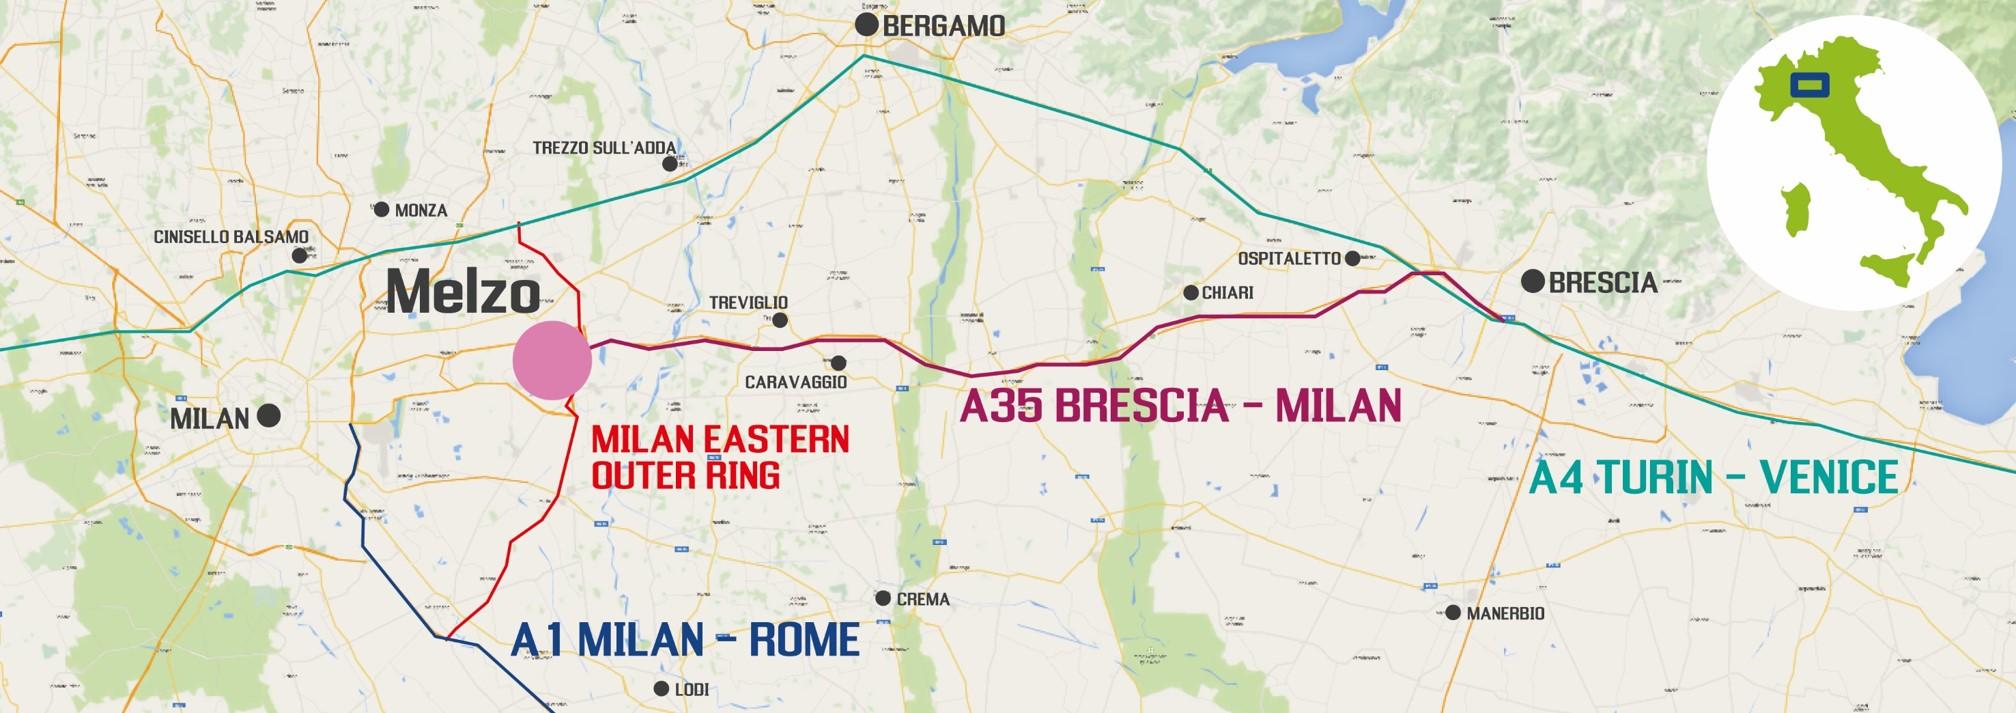 RHM Location